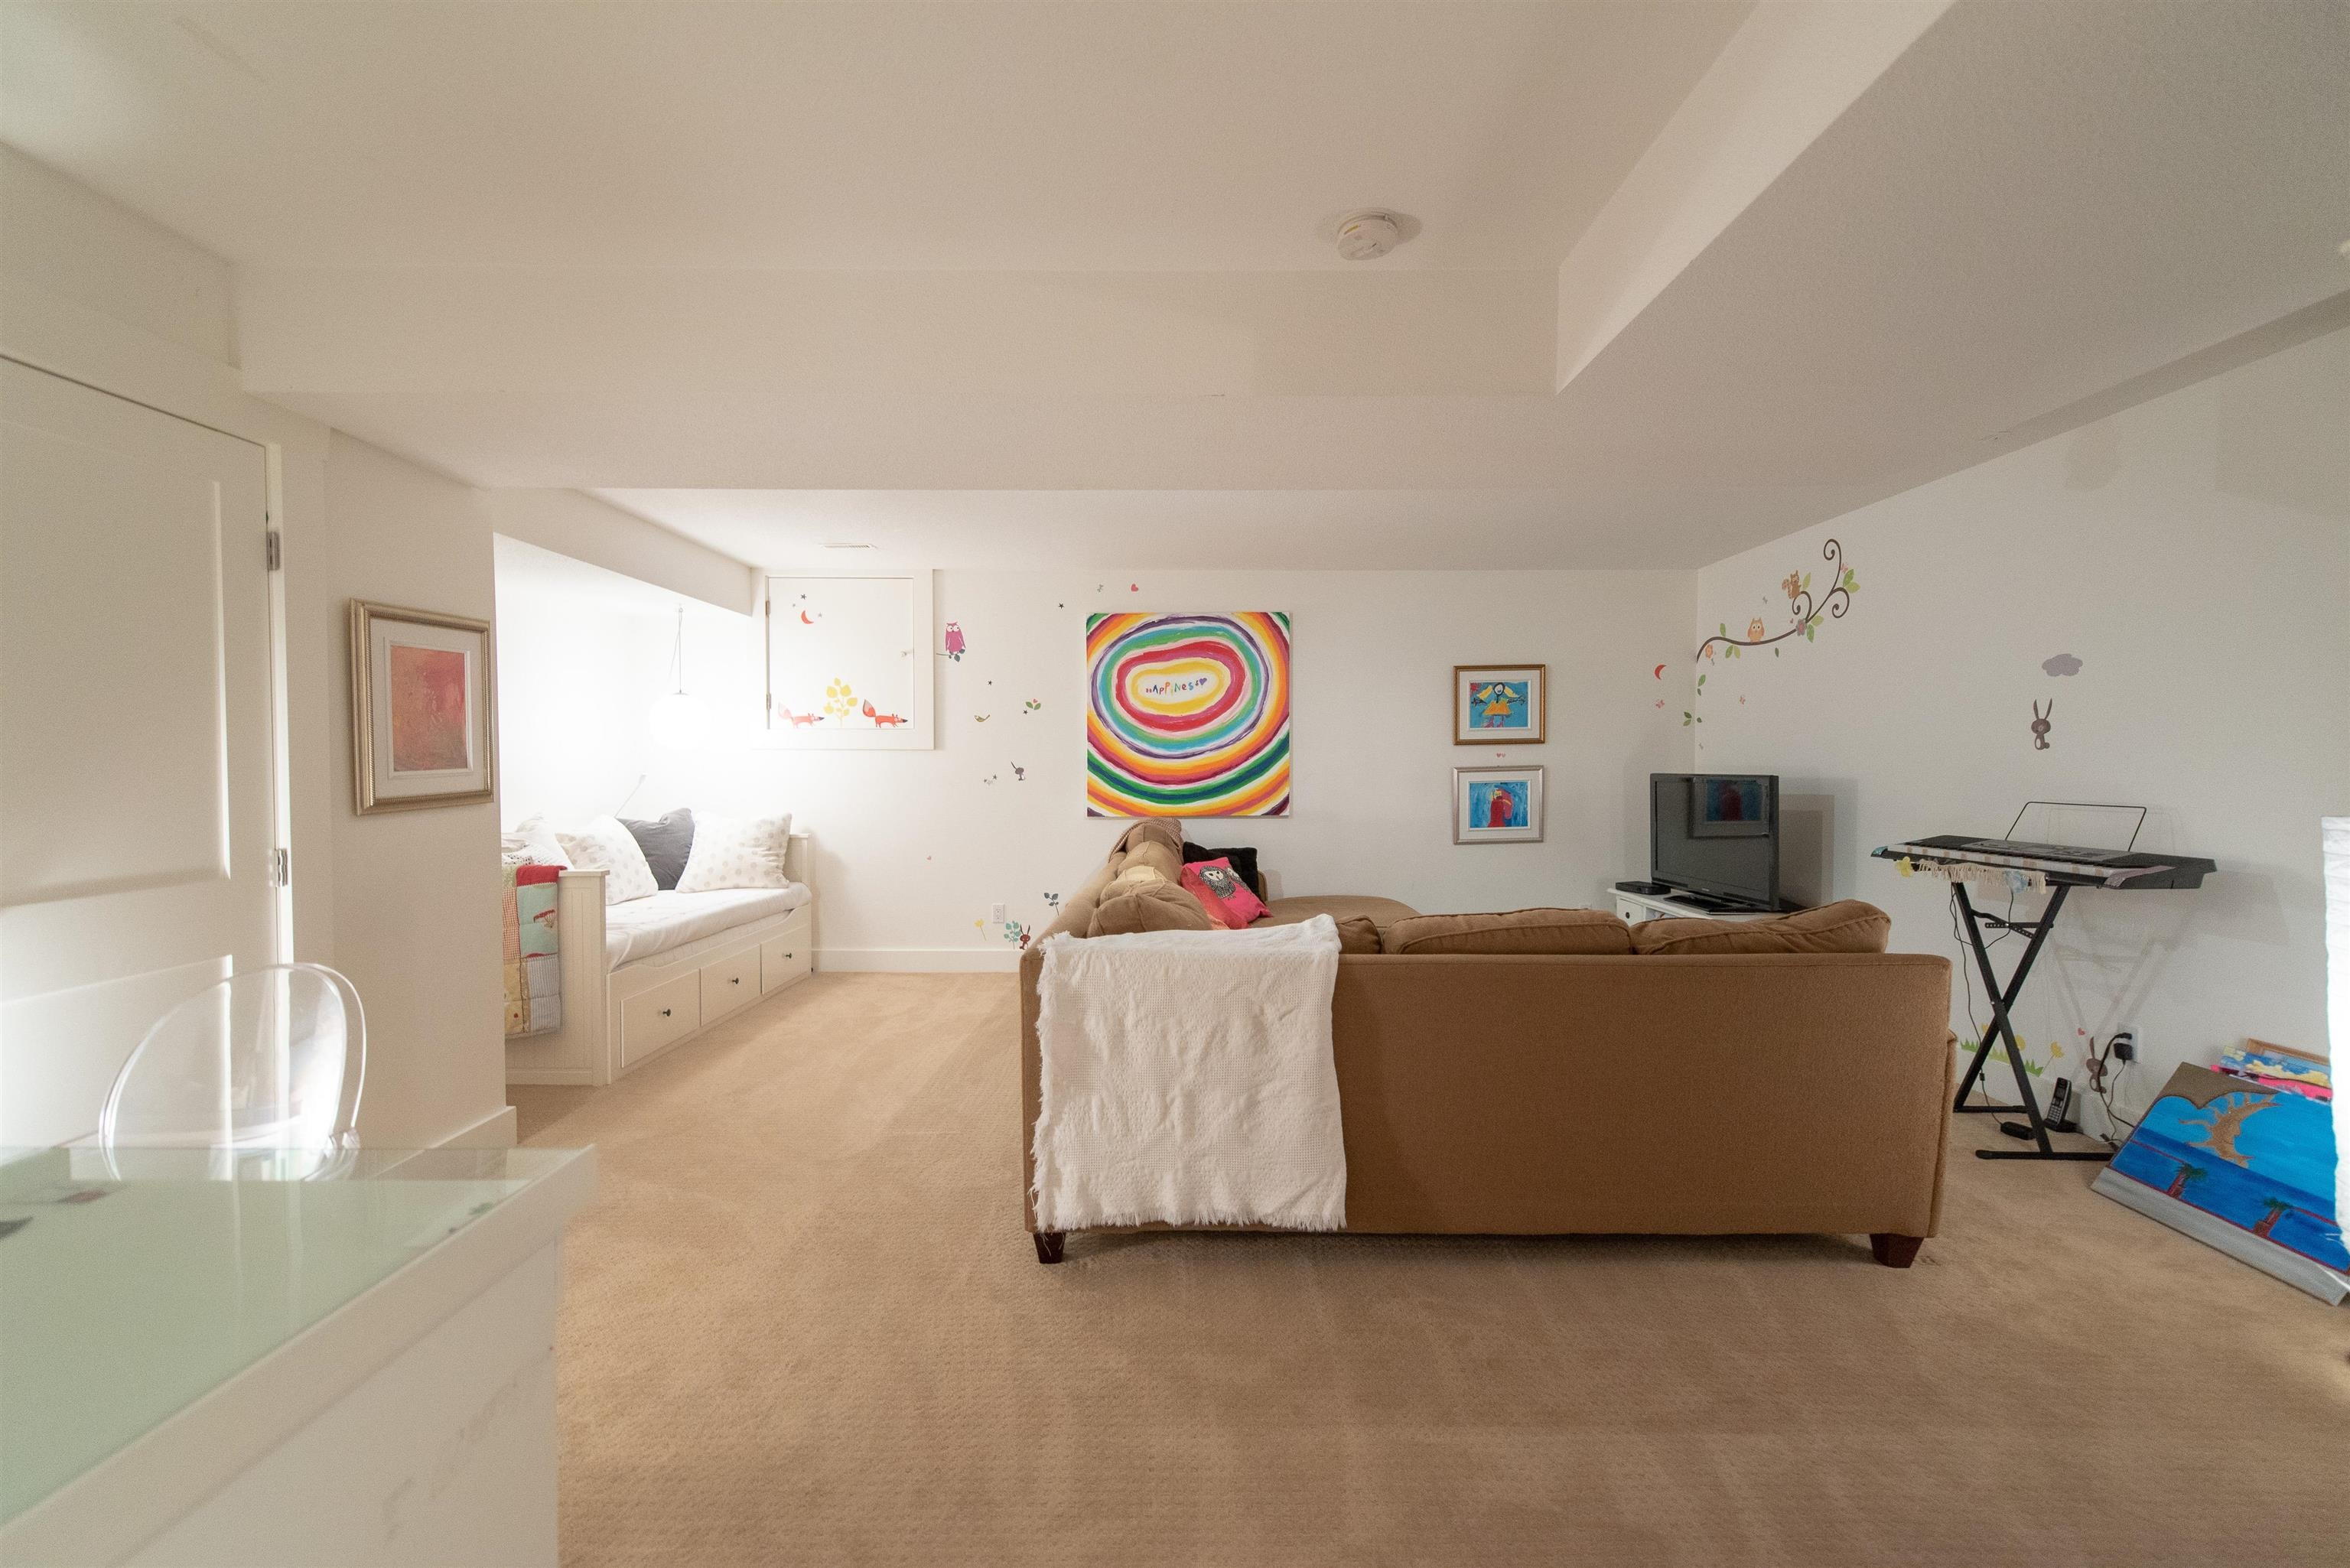 2321 MARINE DRIVE - Dundarave 1/2 Duplex for sale, 3 Bedrooms (R2617952) - #28